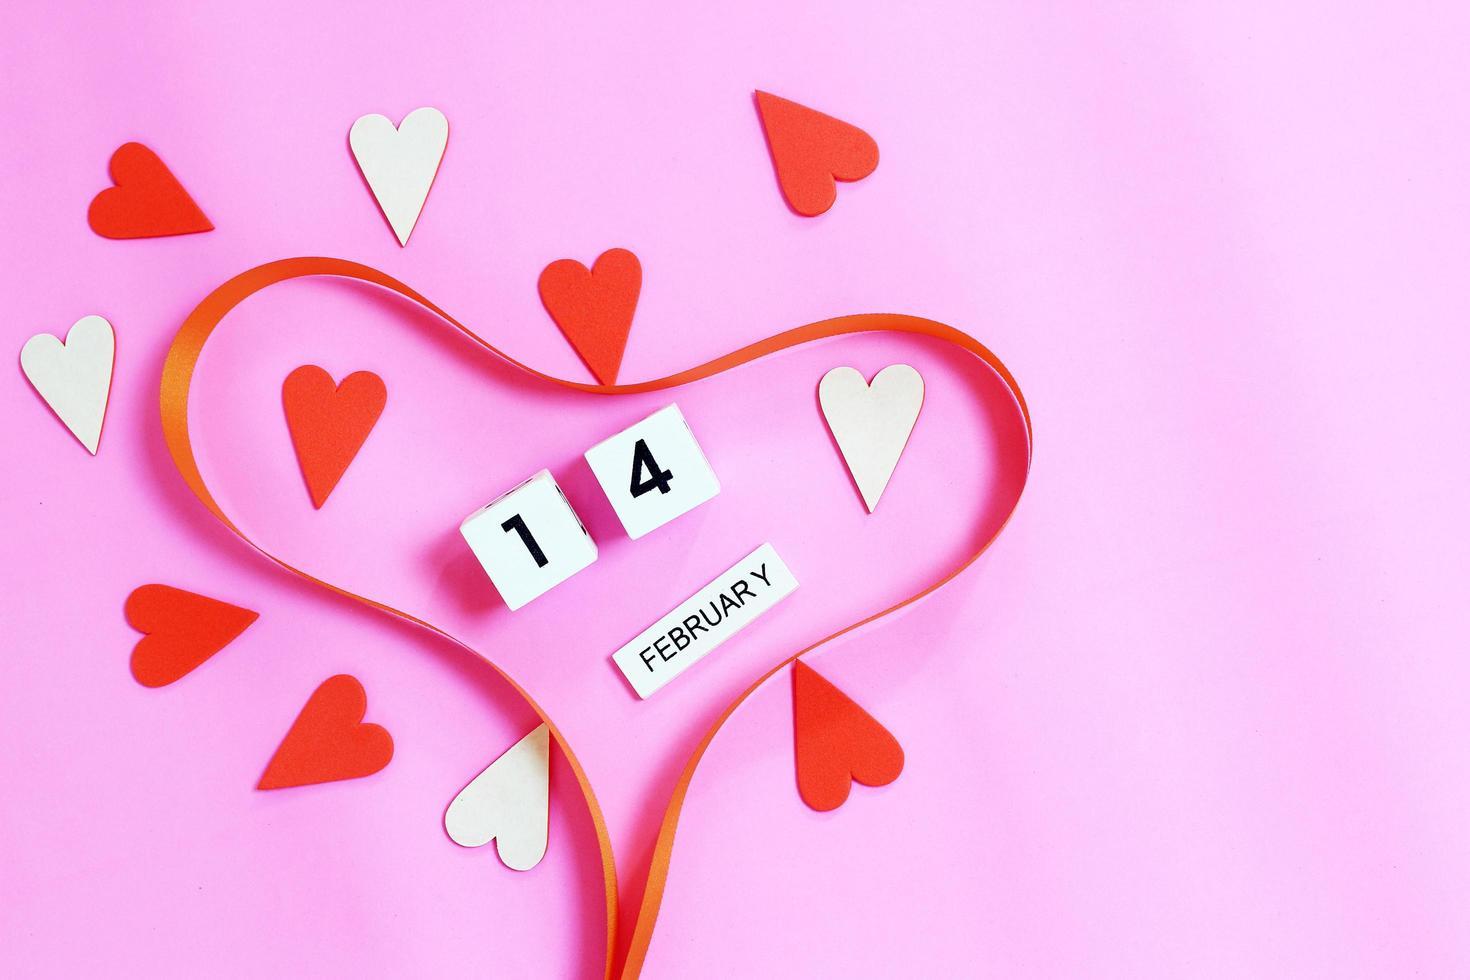 corazon de san valentin foto